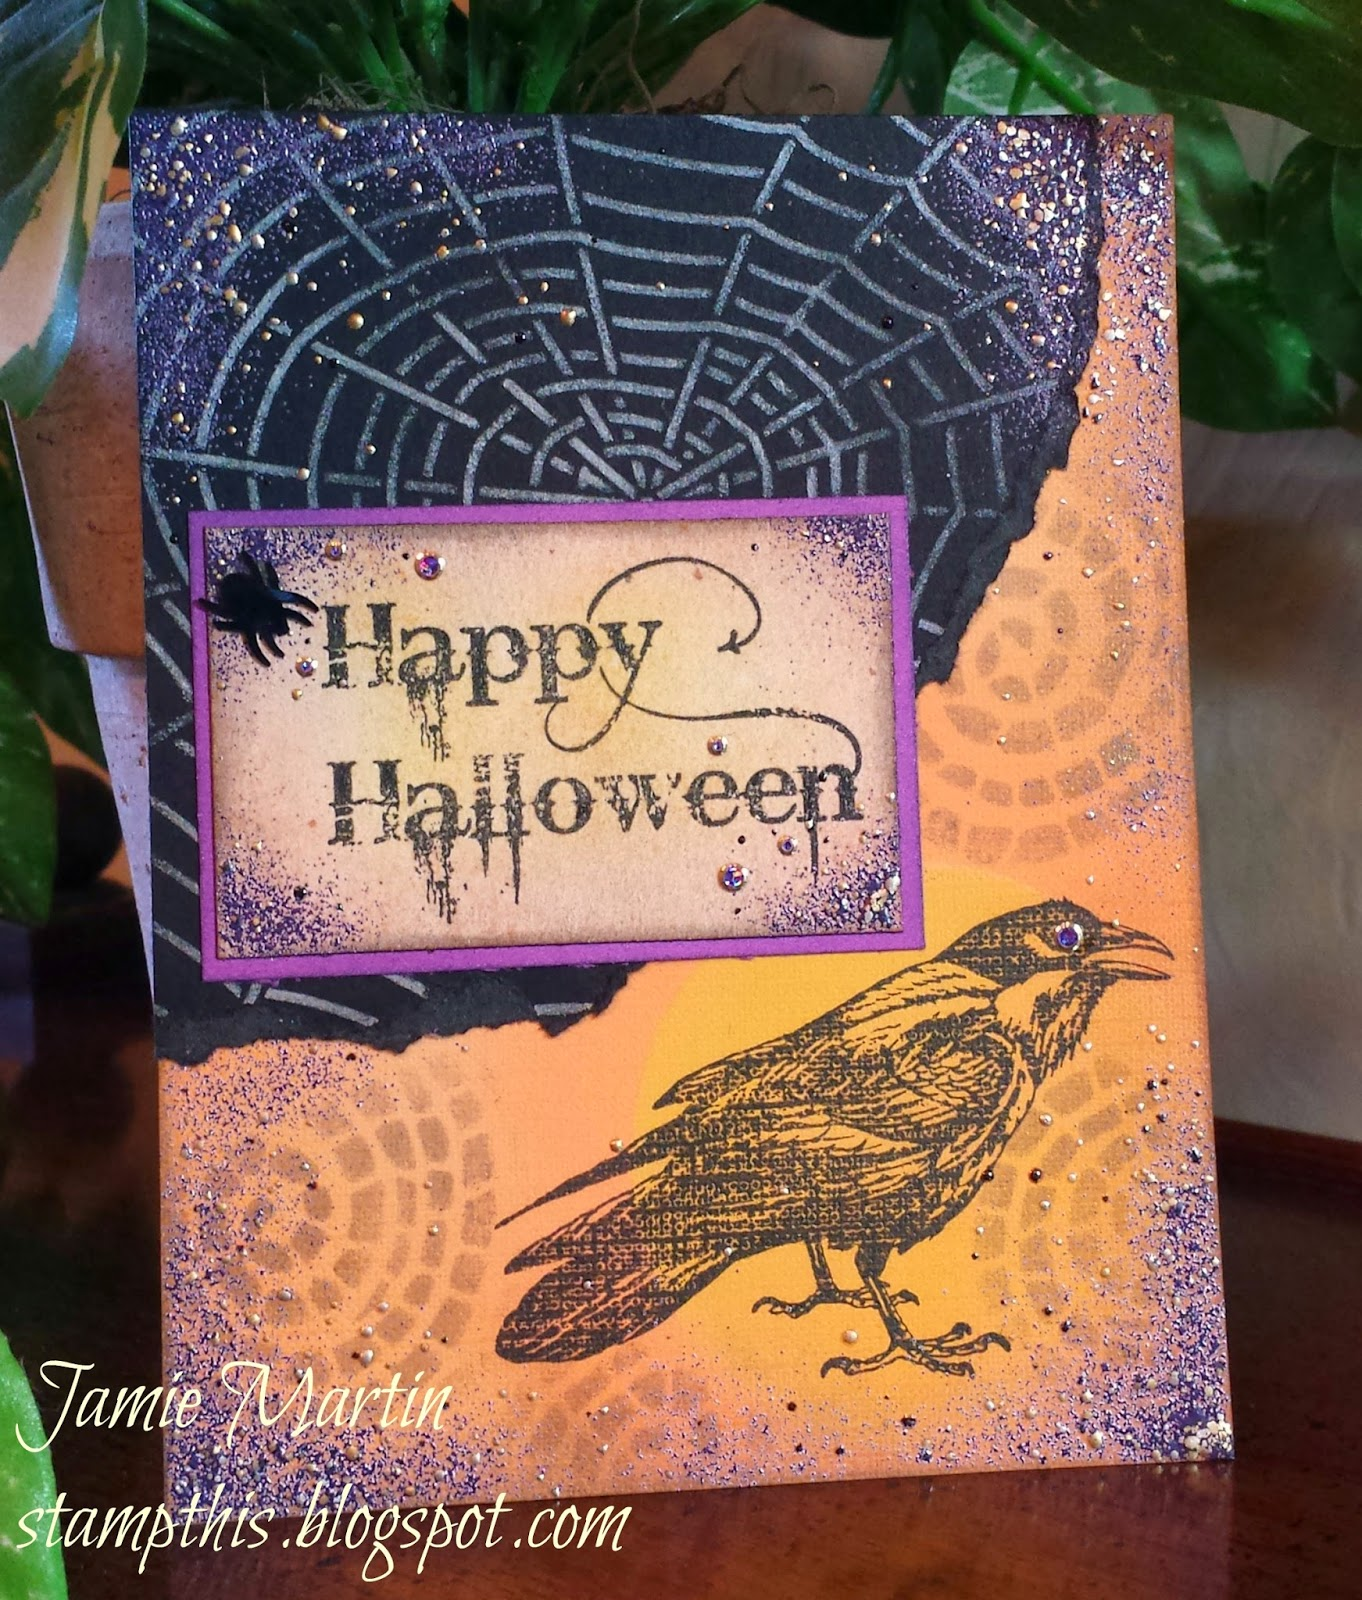 http://2.bp.blogspot.com/-7cnEwjN4koY/VDL2lBhDvNI/AAAAAAAAB_Q/lKD_Rz4LhCA/s1600/Raven+Halloween+DW+STM+watermark+10-2014.jpg